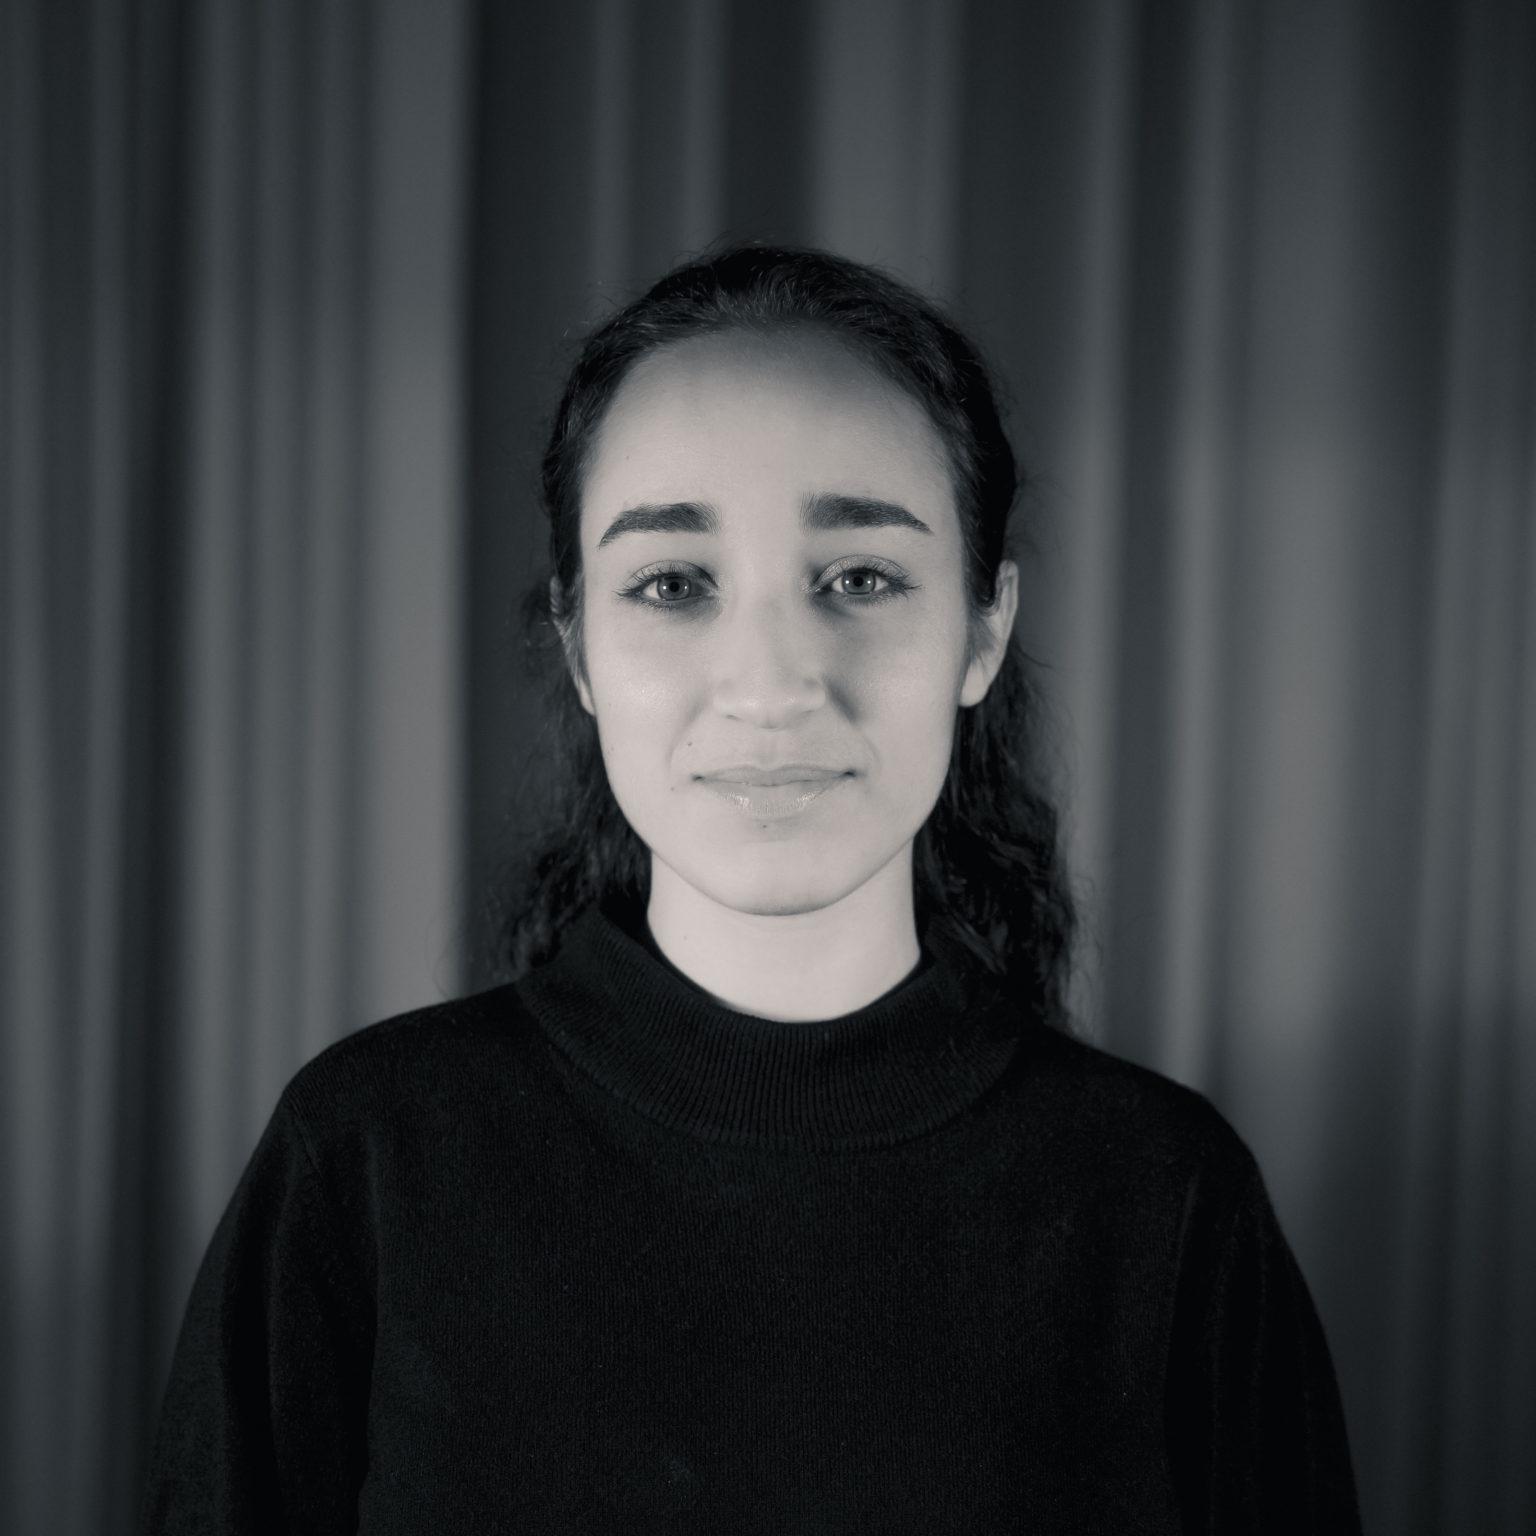 Hannah Grech Pirrotta